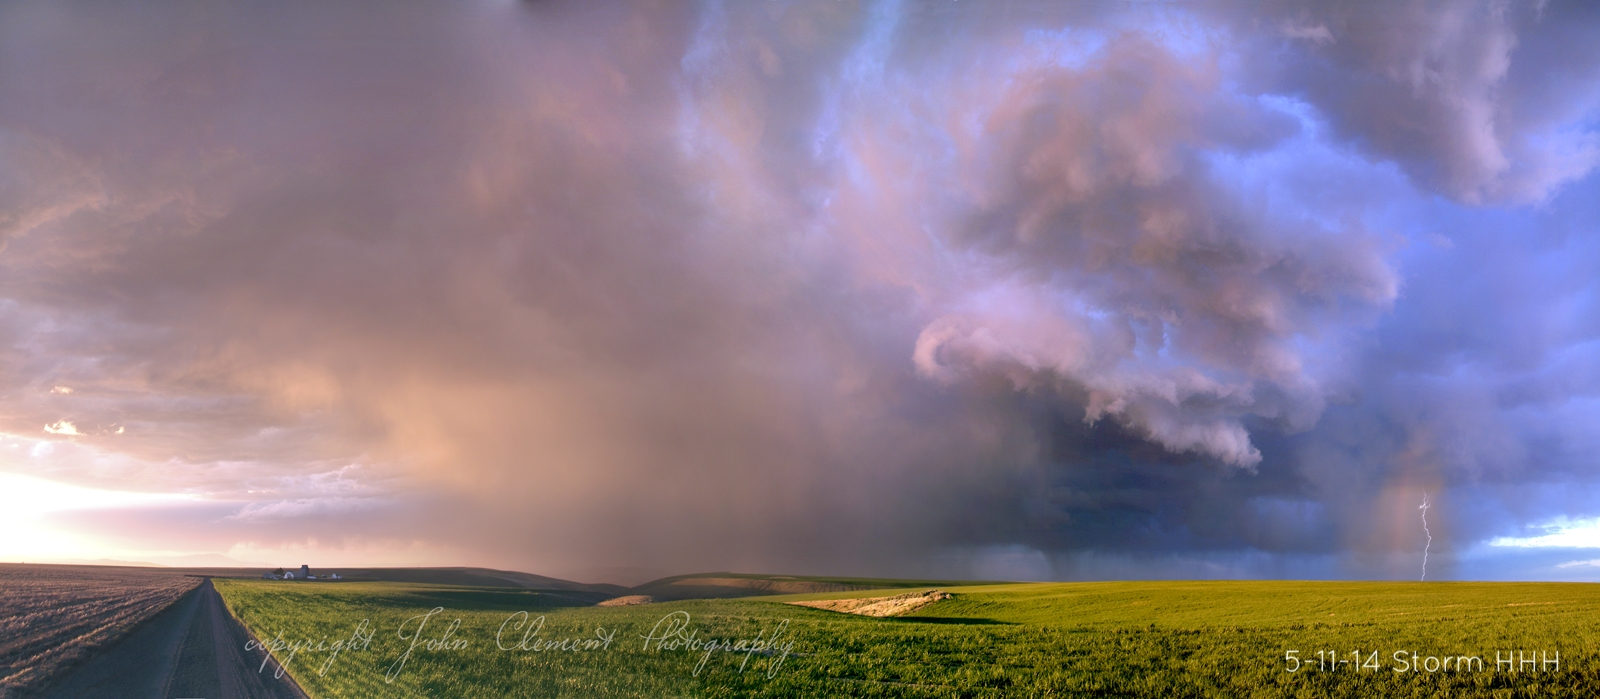 5-11 storm-14.jpg